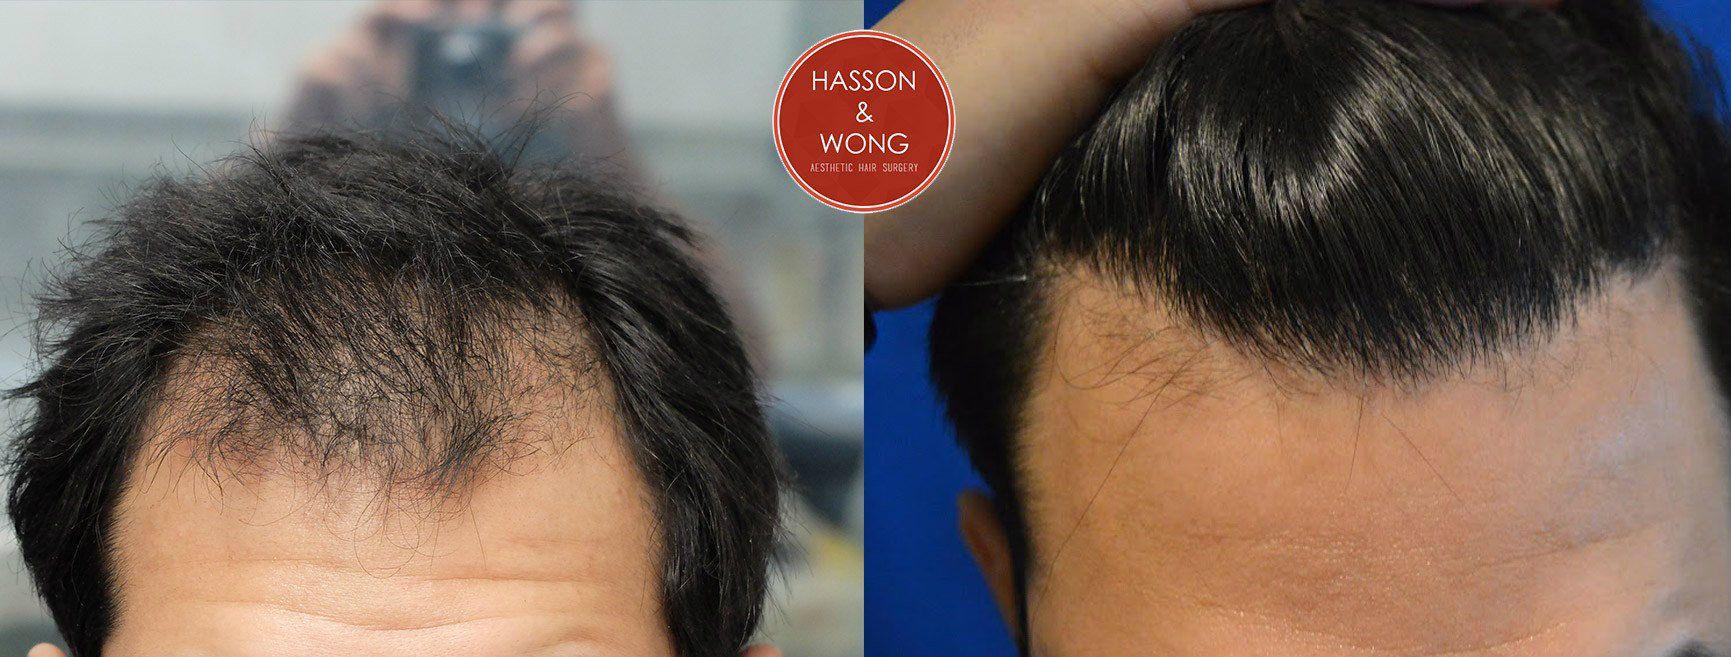 hasson wong hair transplant haircut